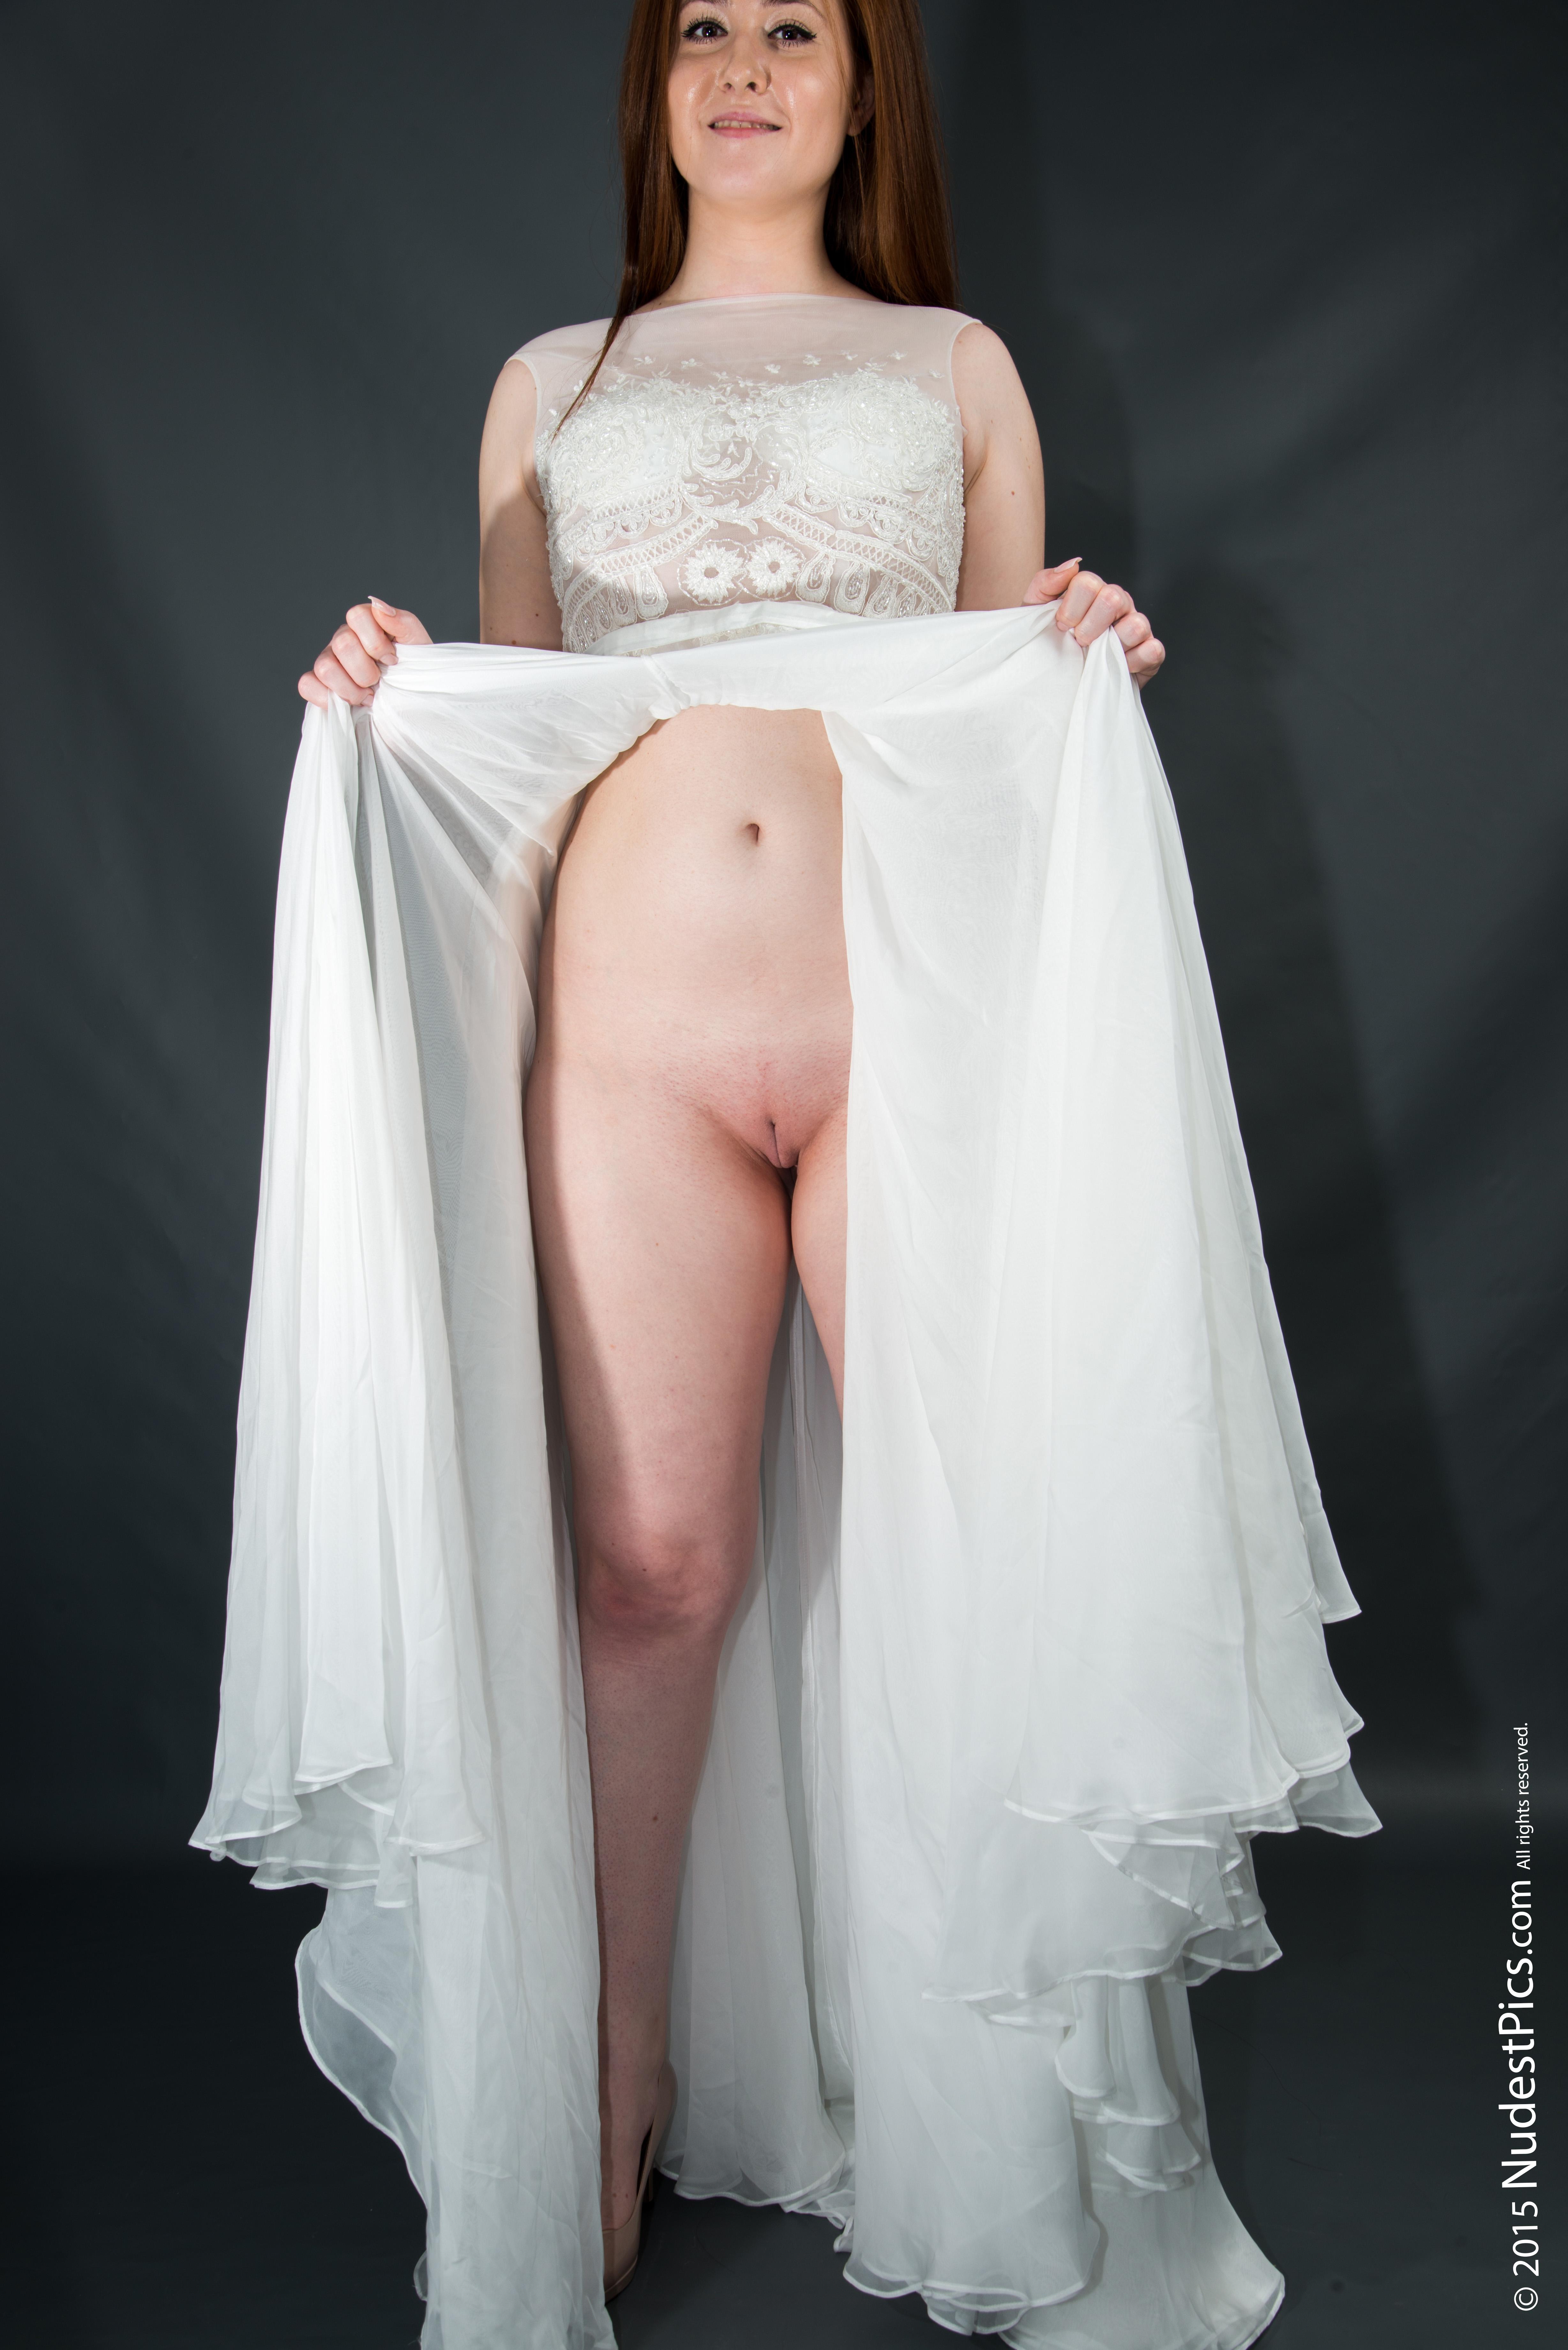 Bride Gal Flashing Pussy